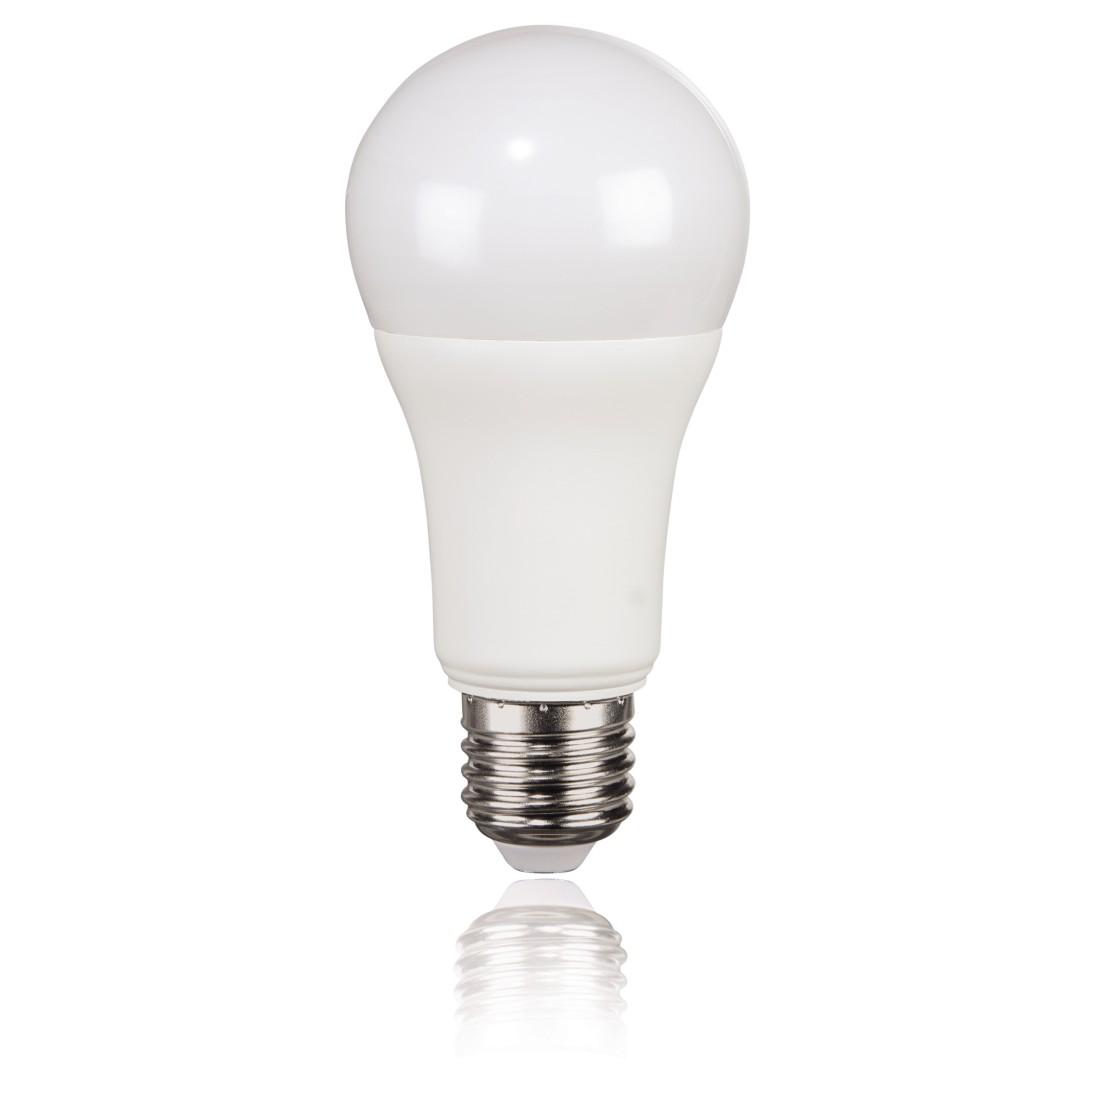 00112177 xavax led lampe e27 1060lm ersetzt 75w gl hlampe warmwei dimmbar. Black Bedroom Furniture Sets. Home Design Ideas